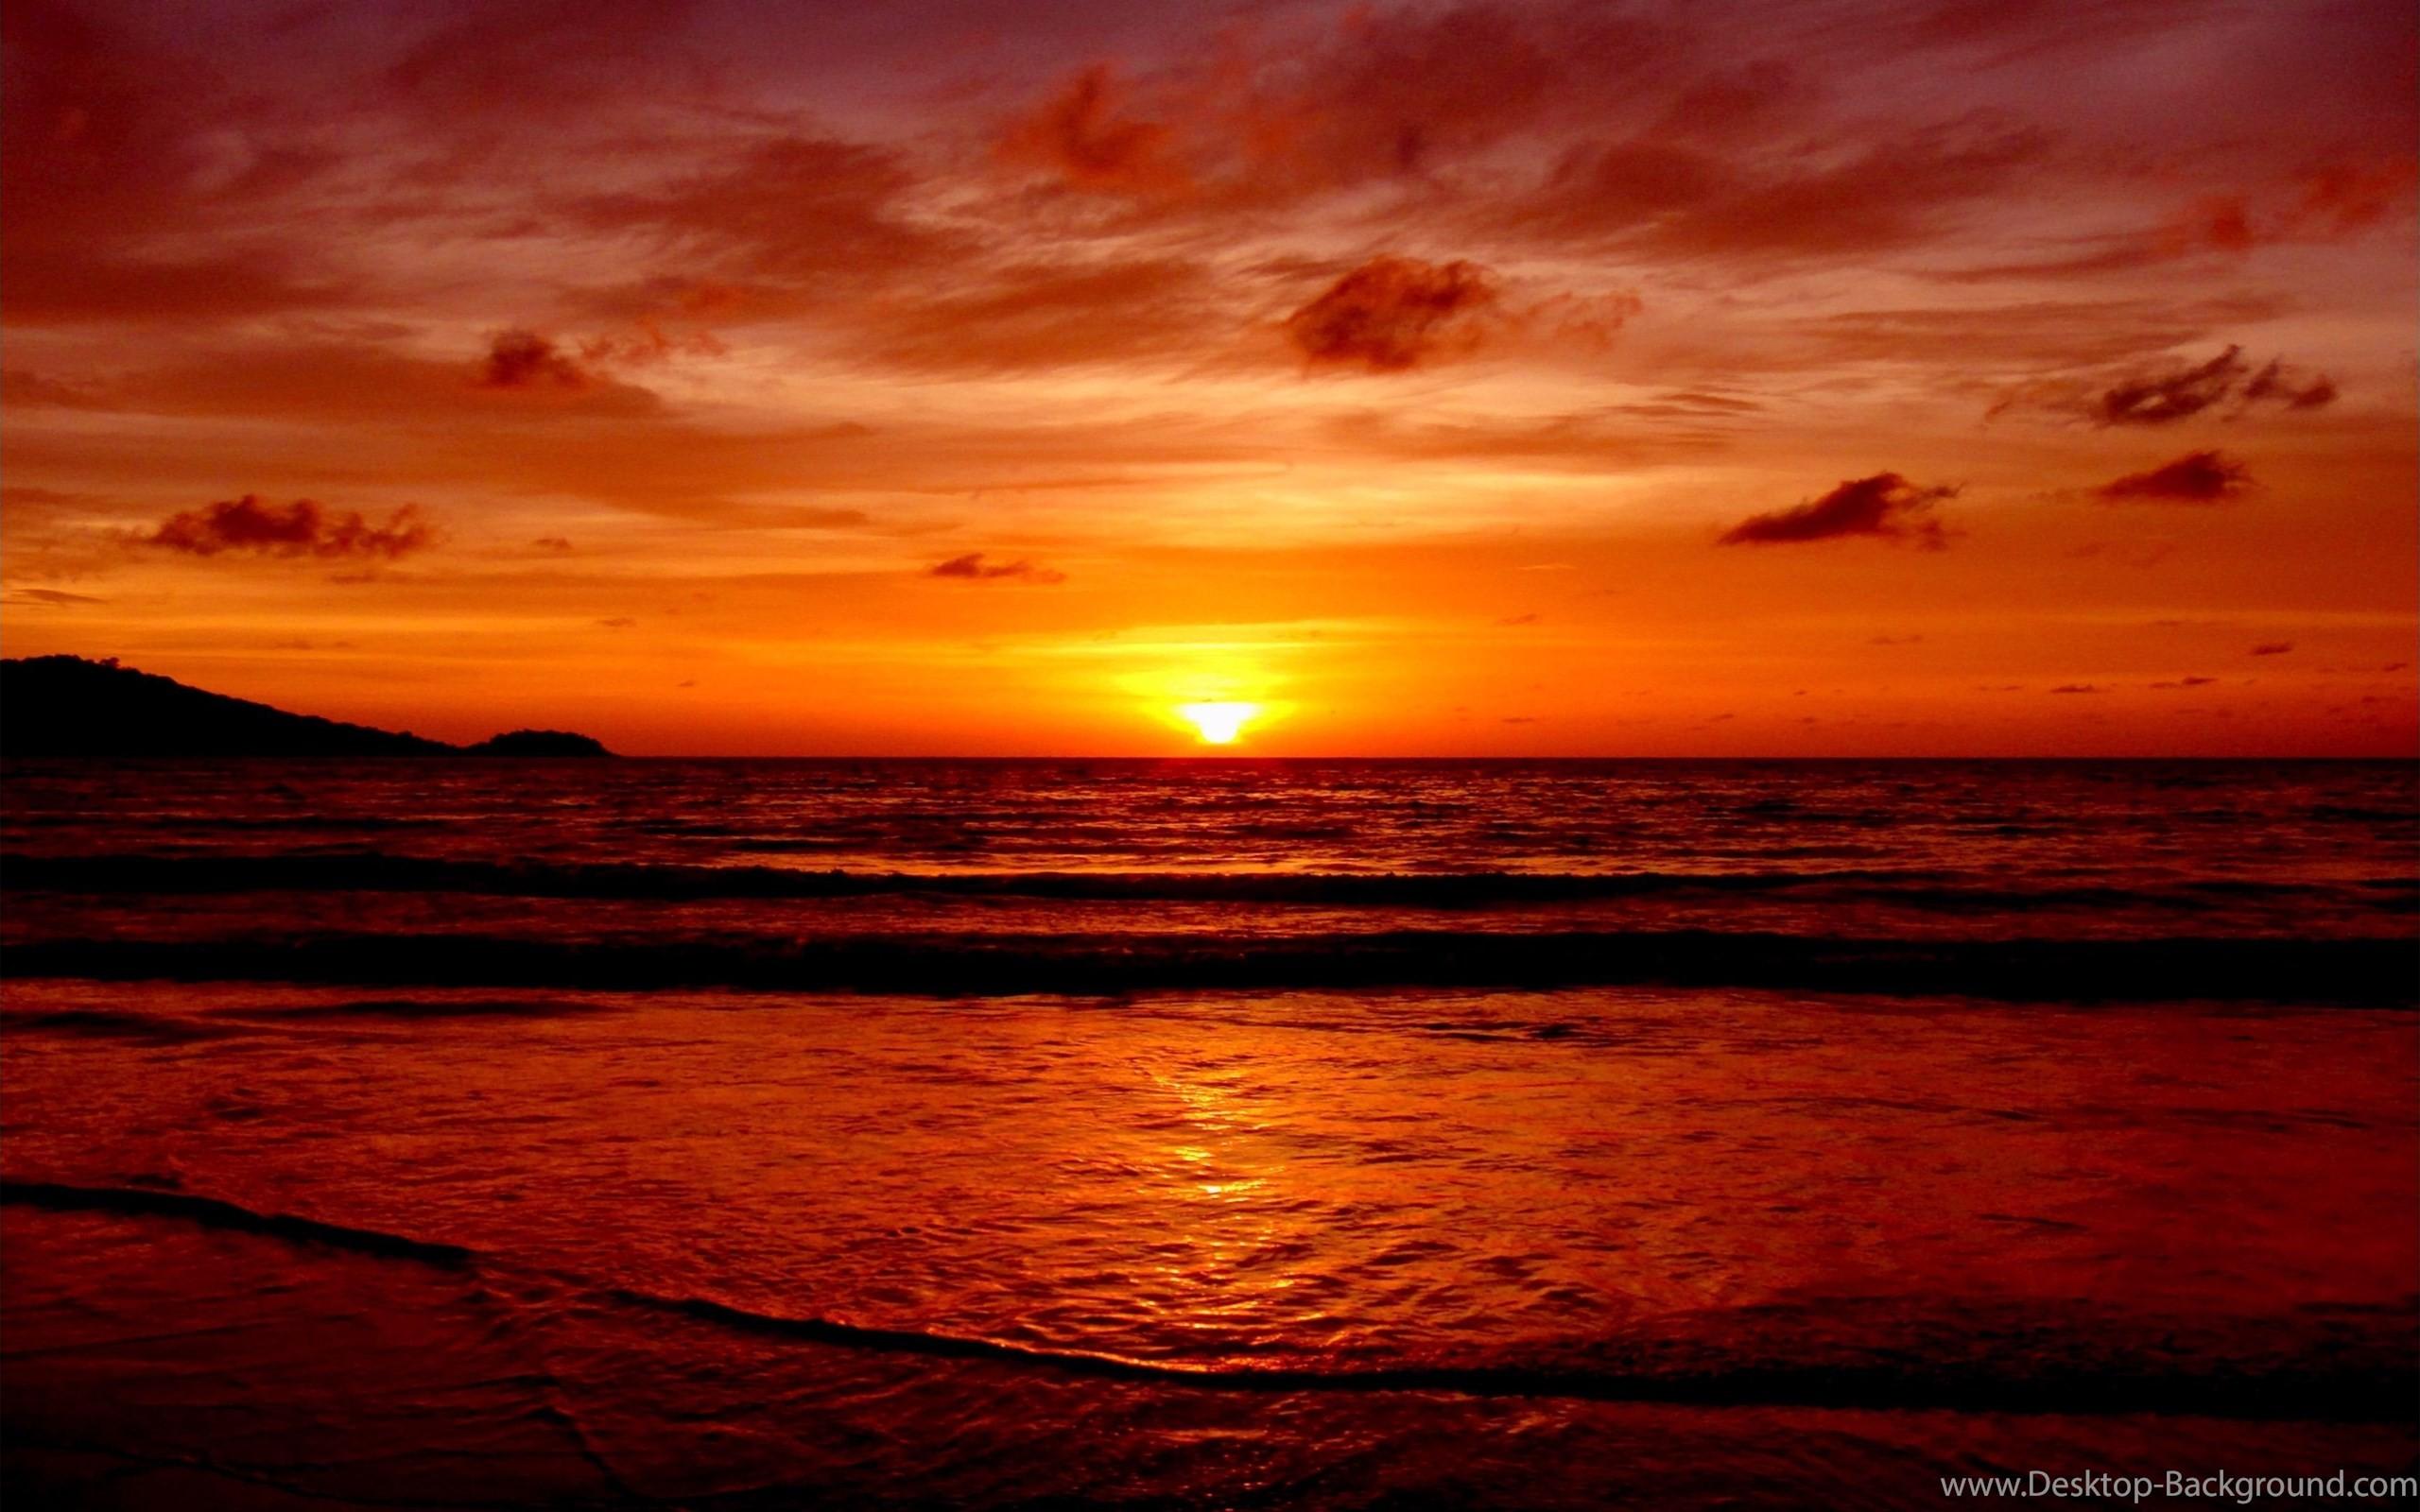 4k Sunset Wallpaper 70 Images